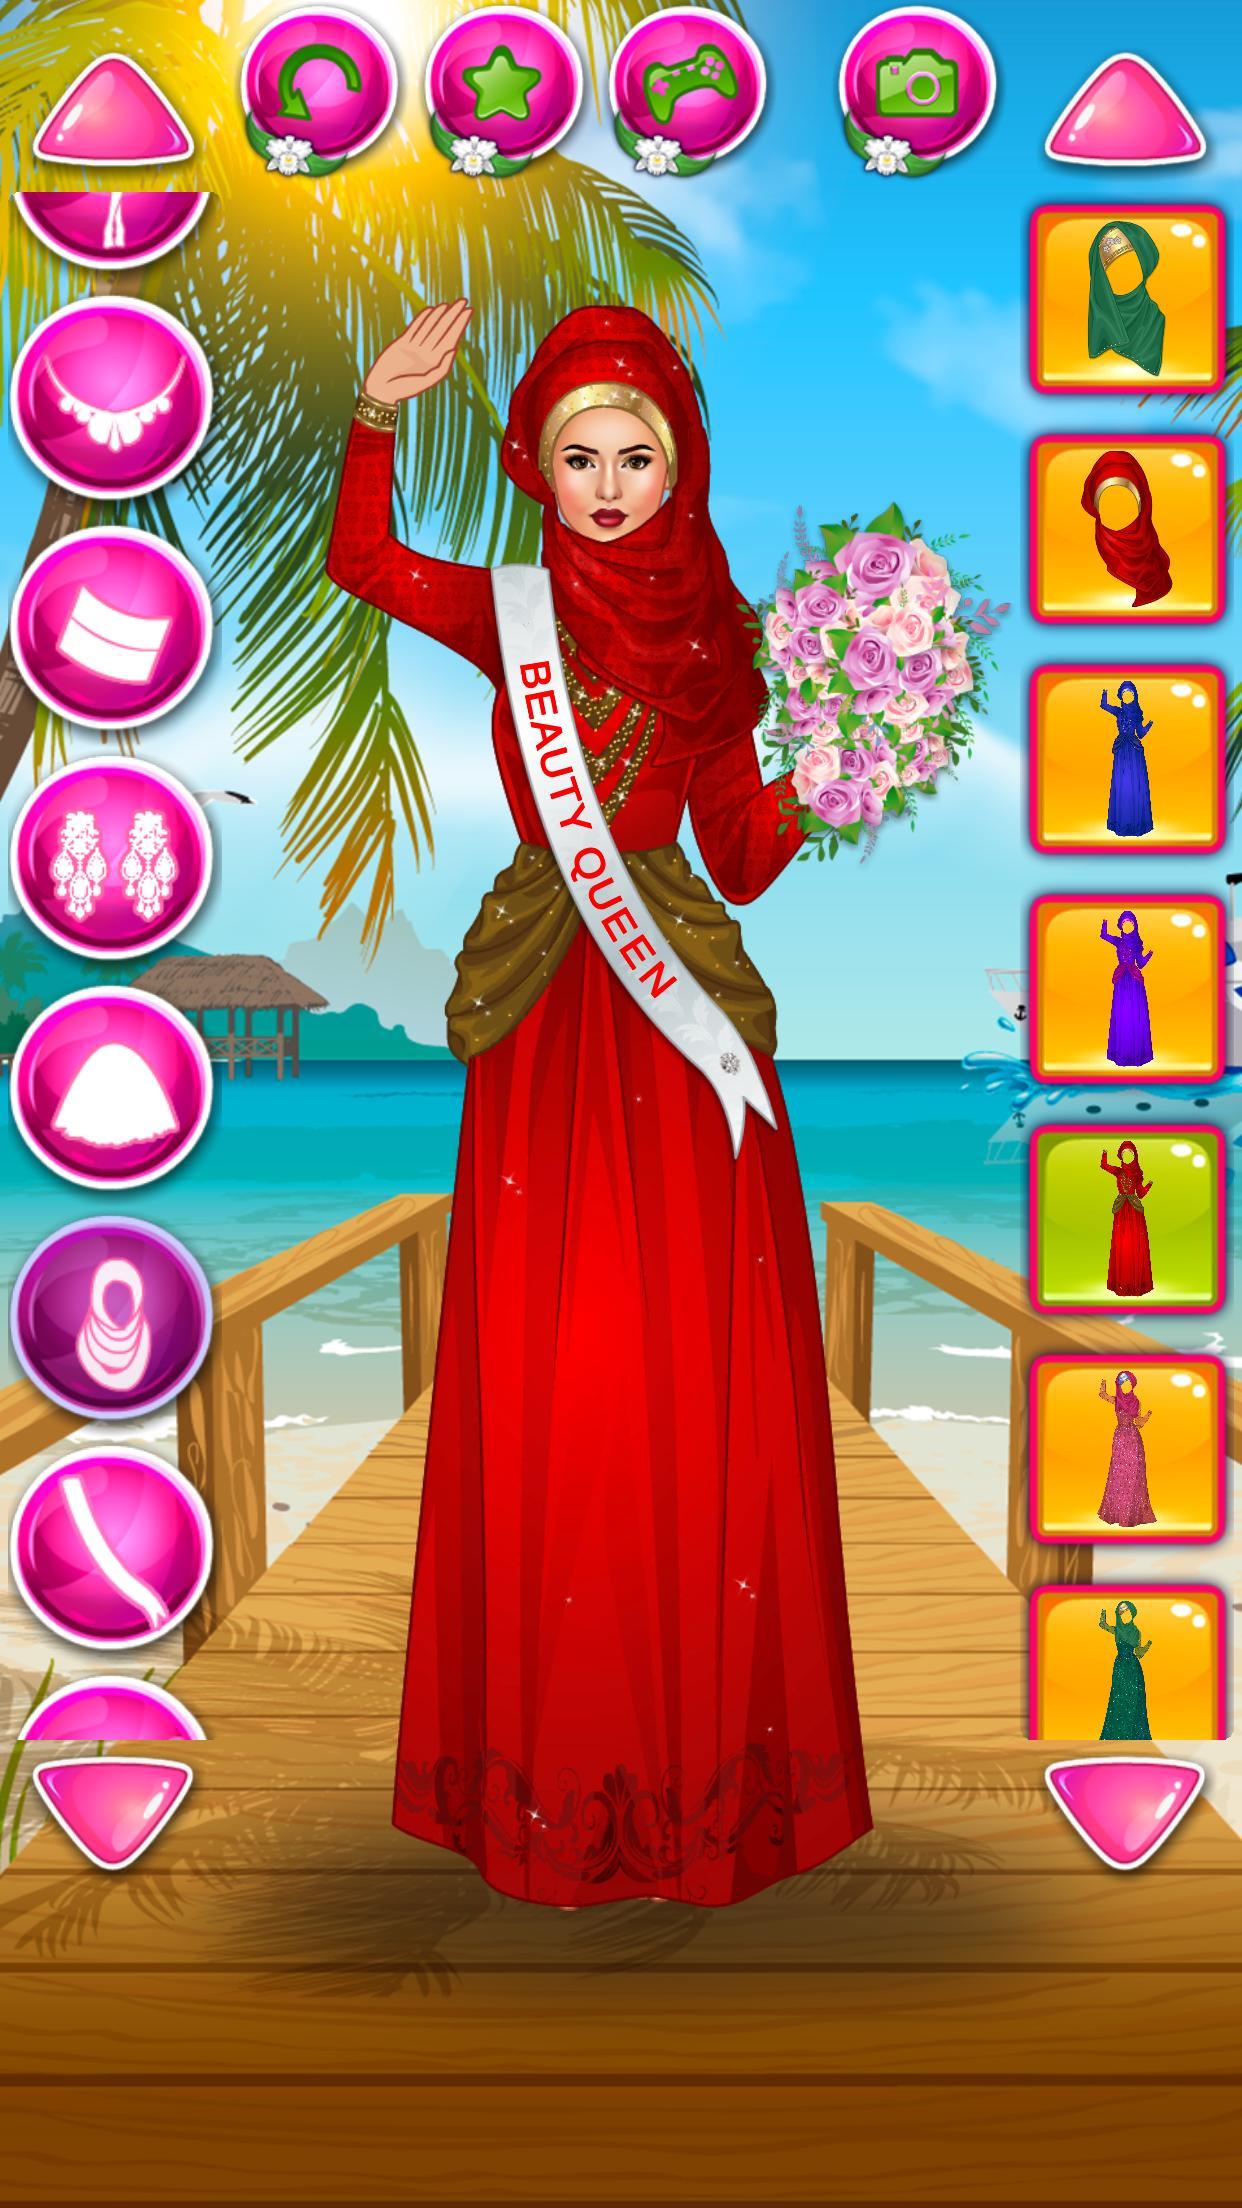 Beauty Queen Dress Up - Star Girl Fashion 1.1 Screenshot 6